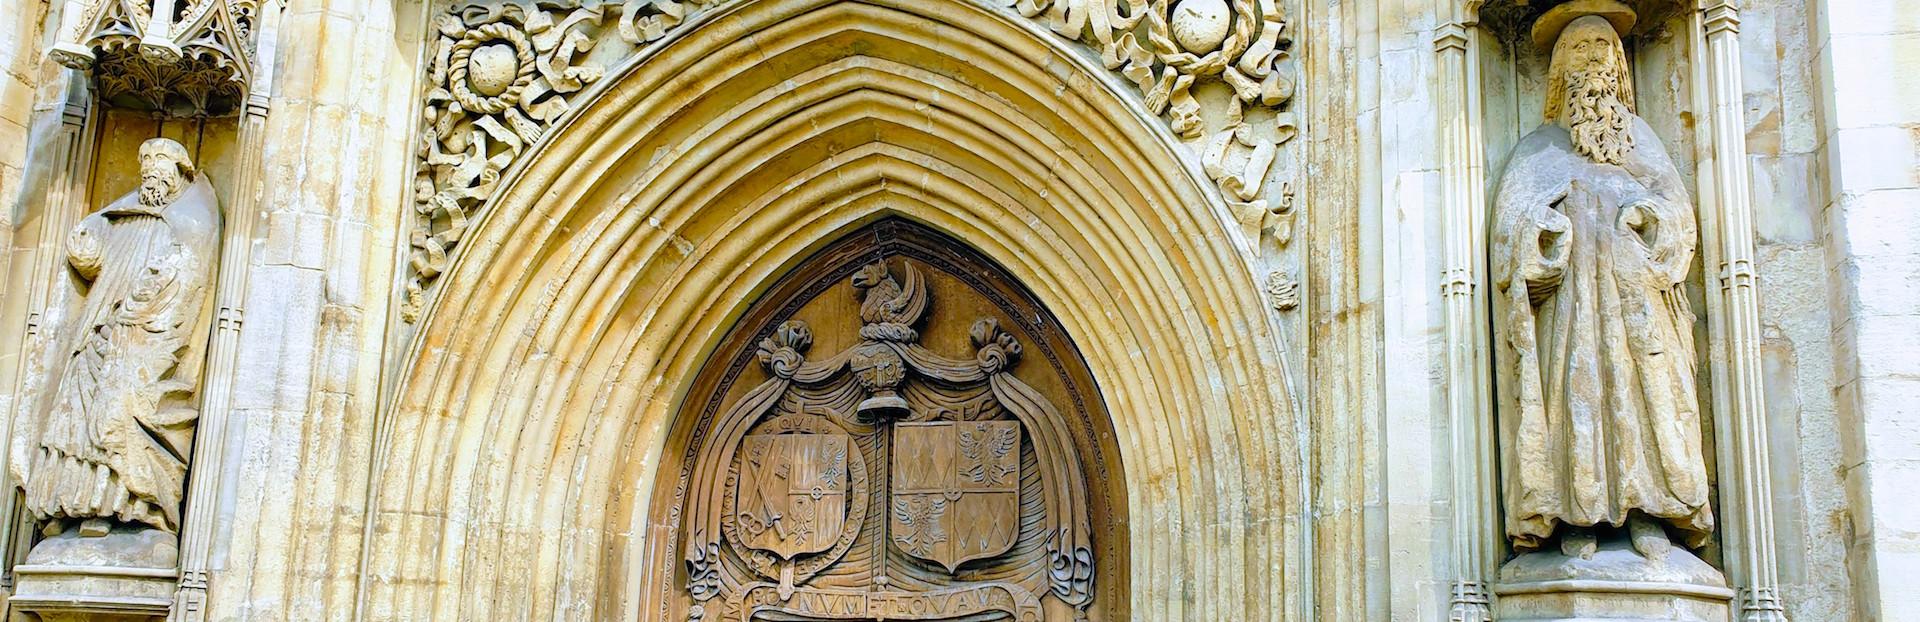 Bath abbey west doors d